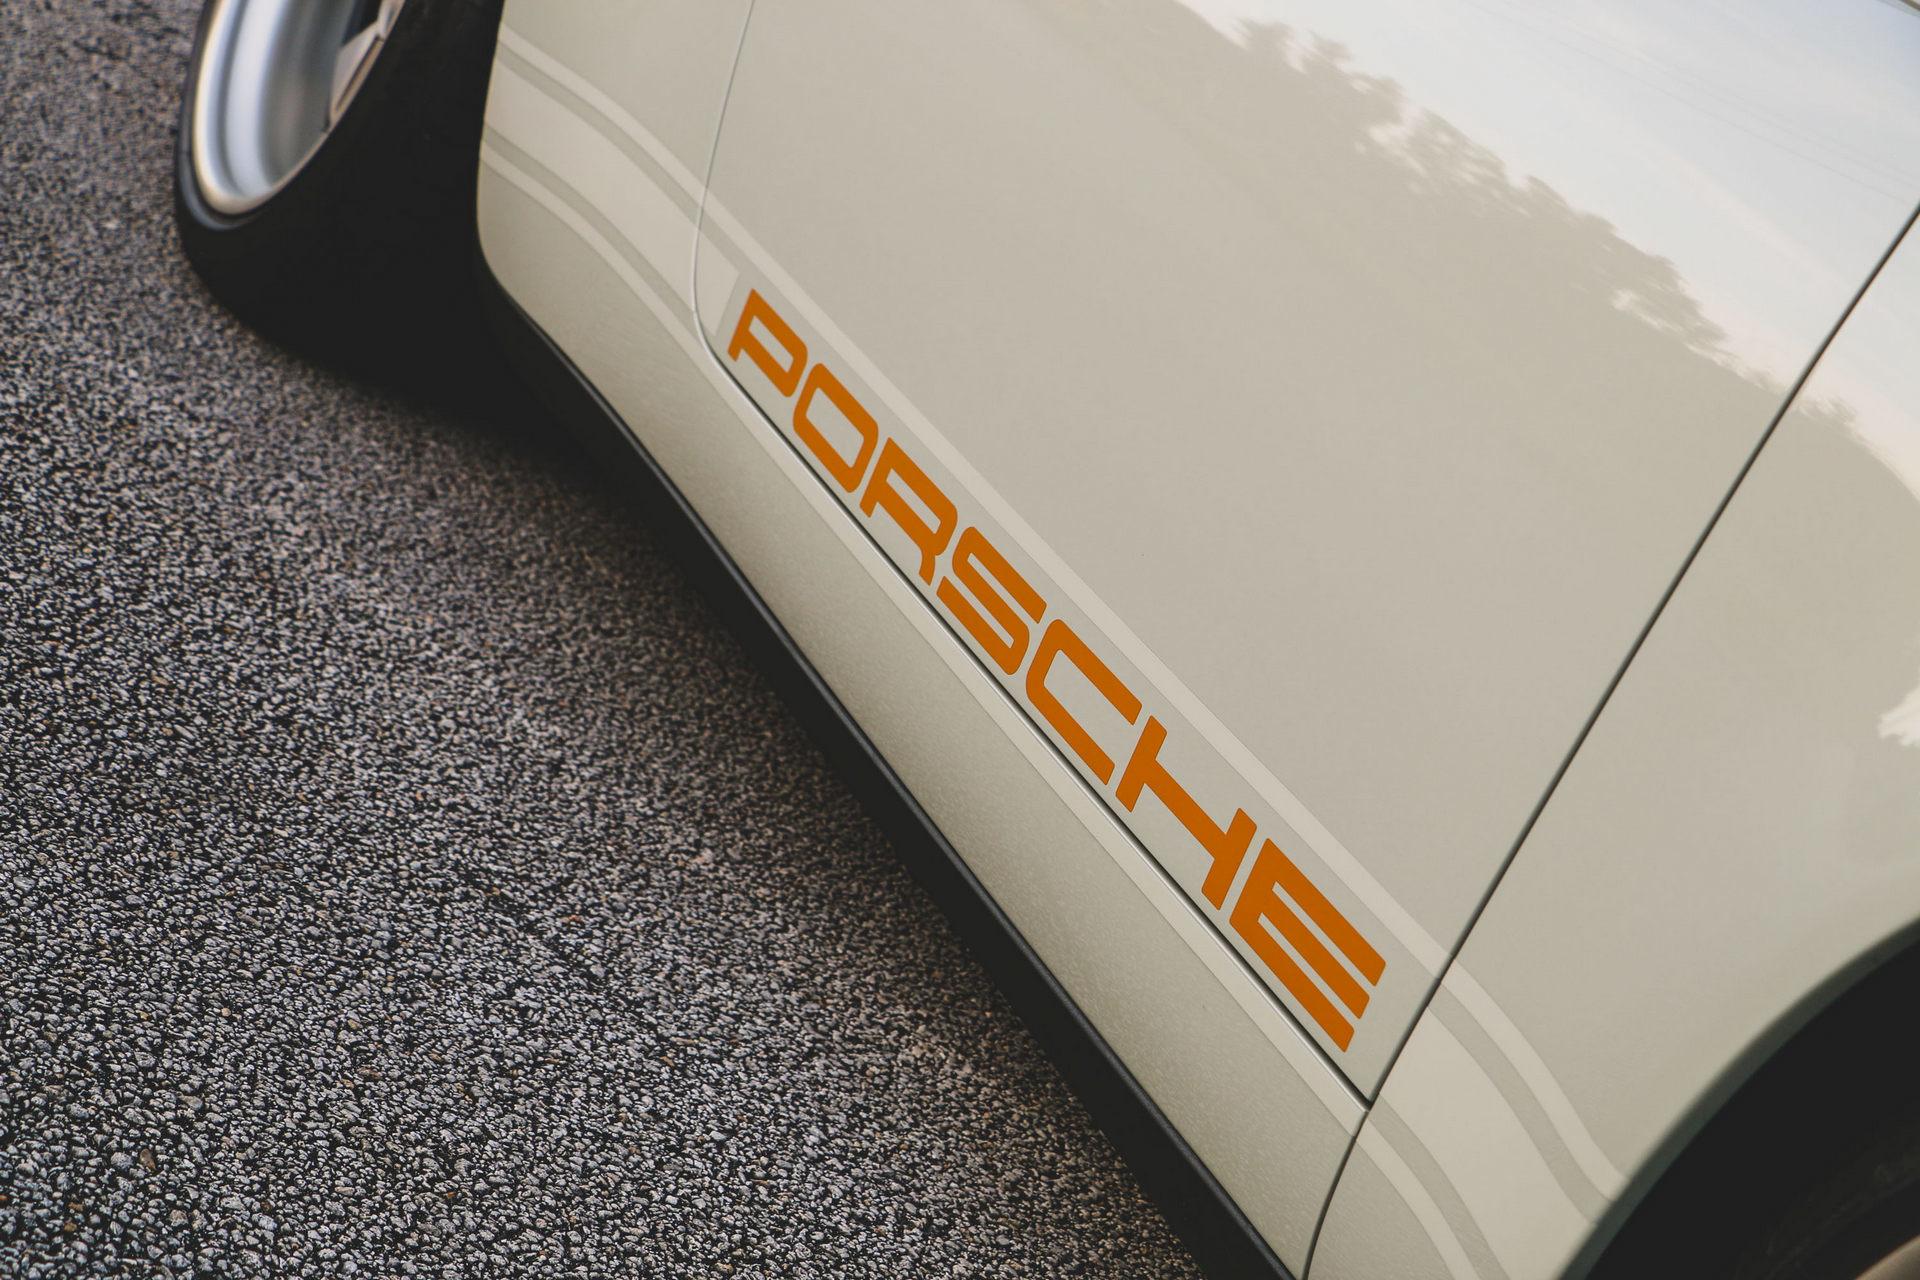 Porsche 911 Singer Venta Rmsothebys 04